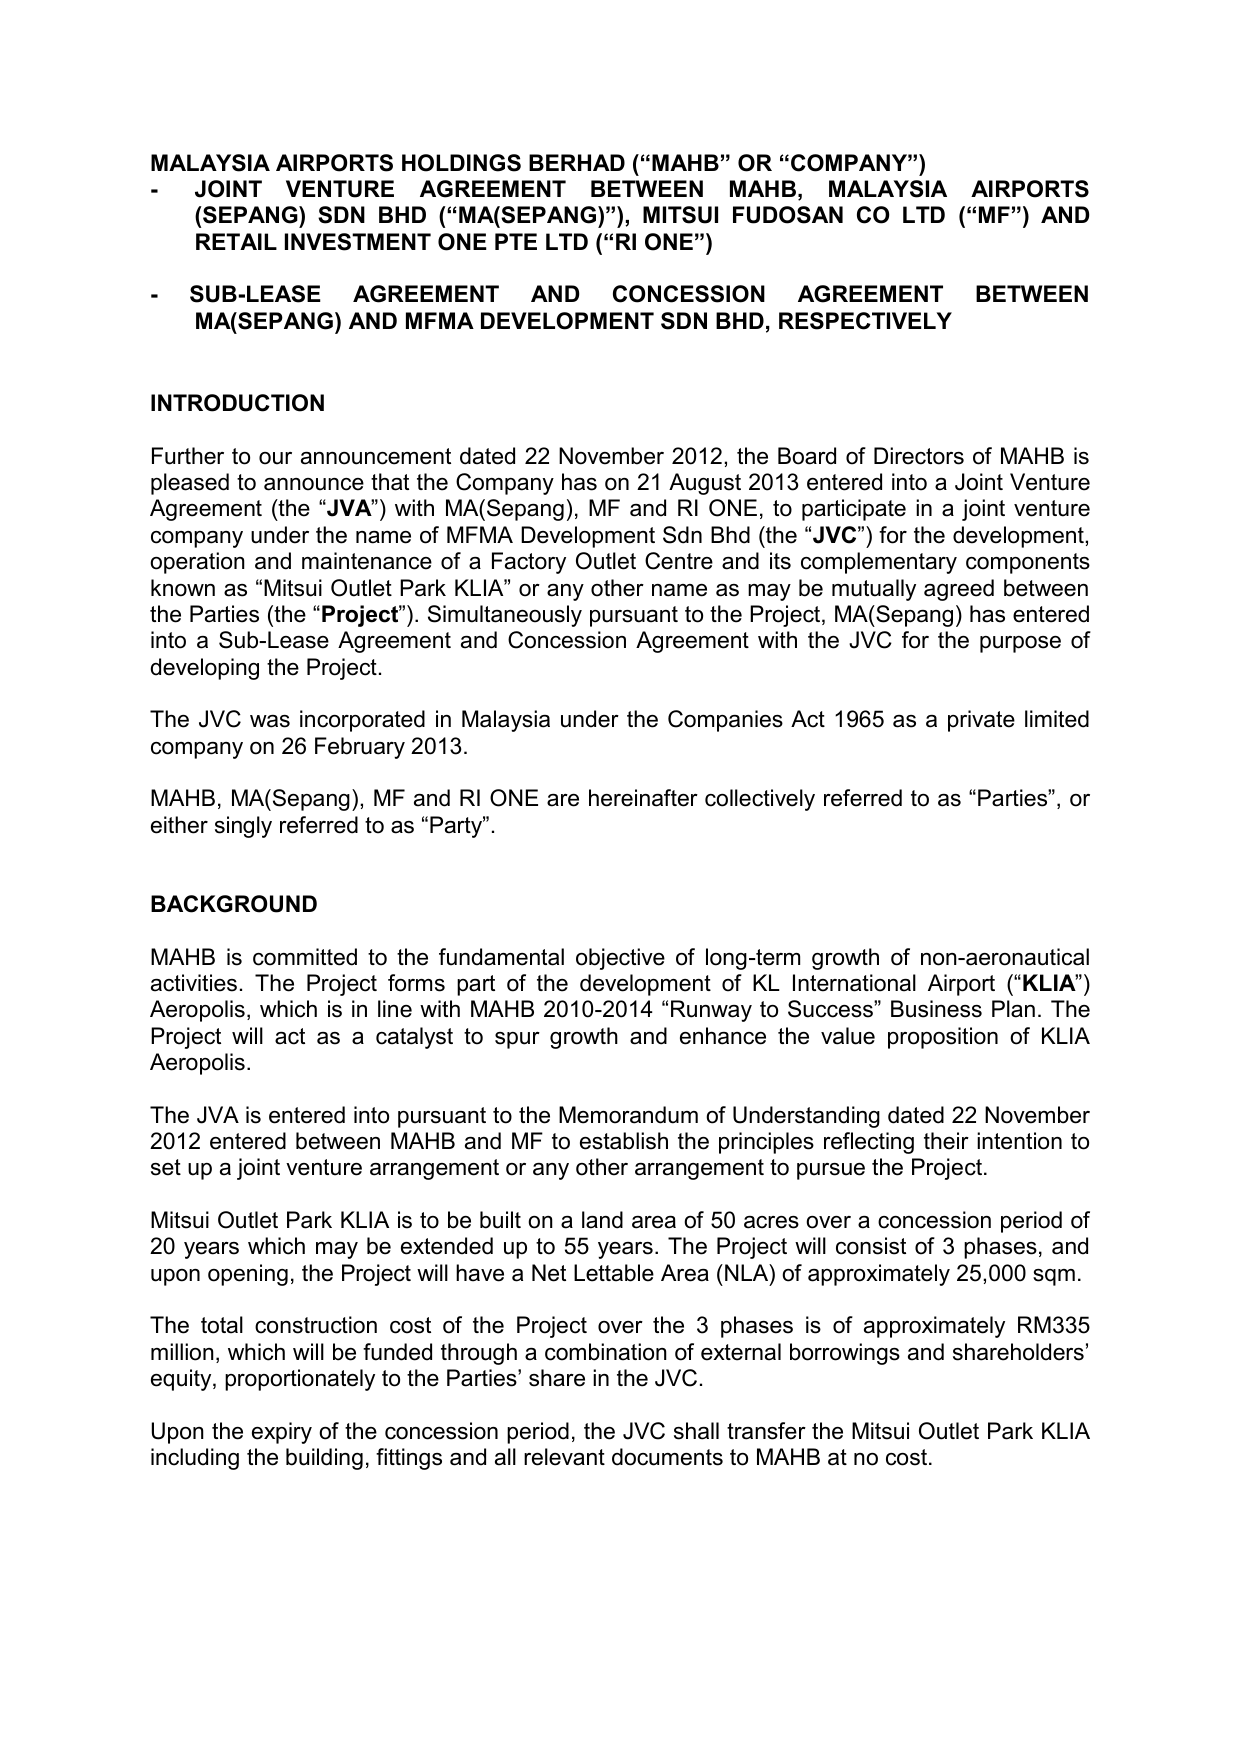 Mahb And Mf Jva Bursa Announcement 00919171